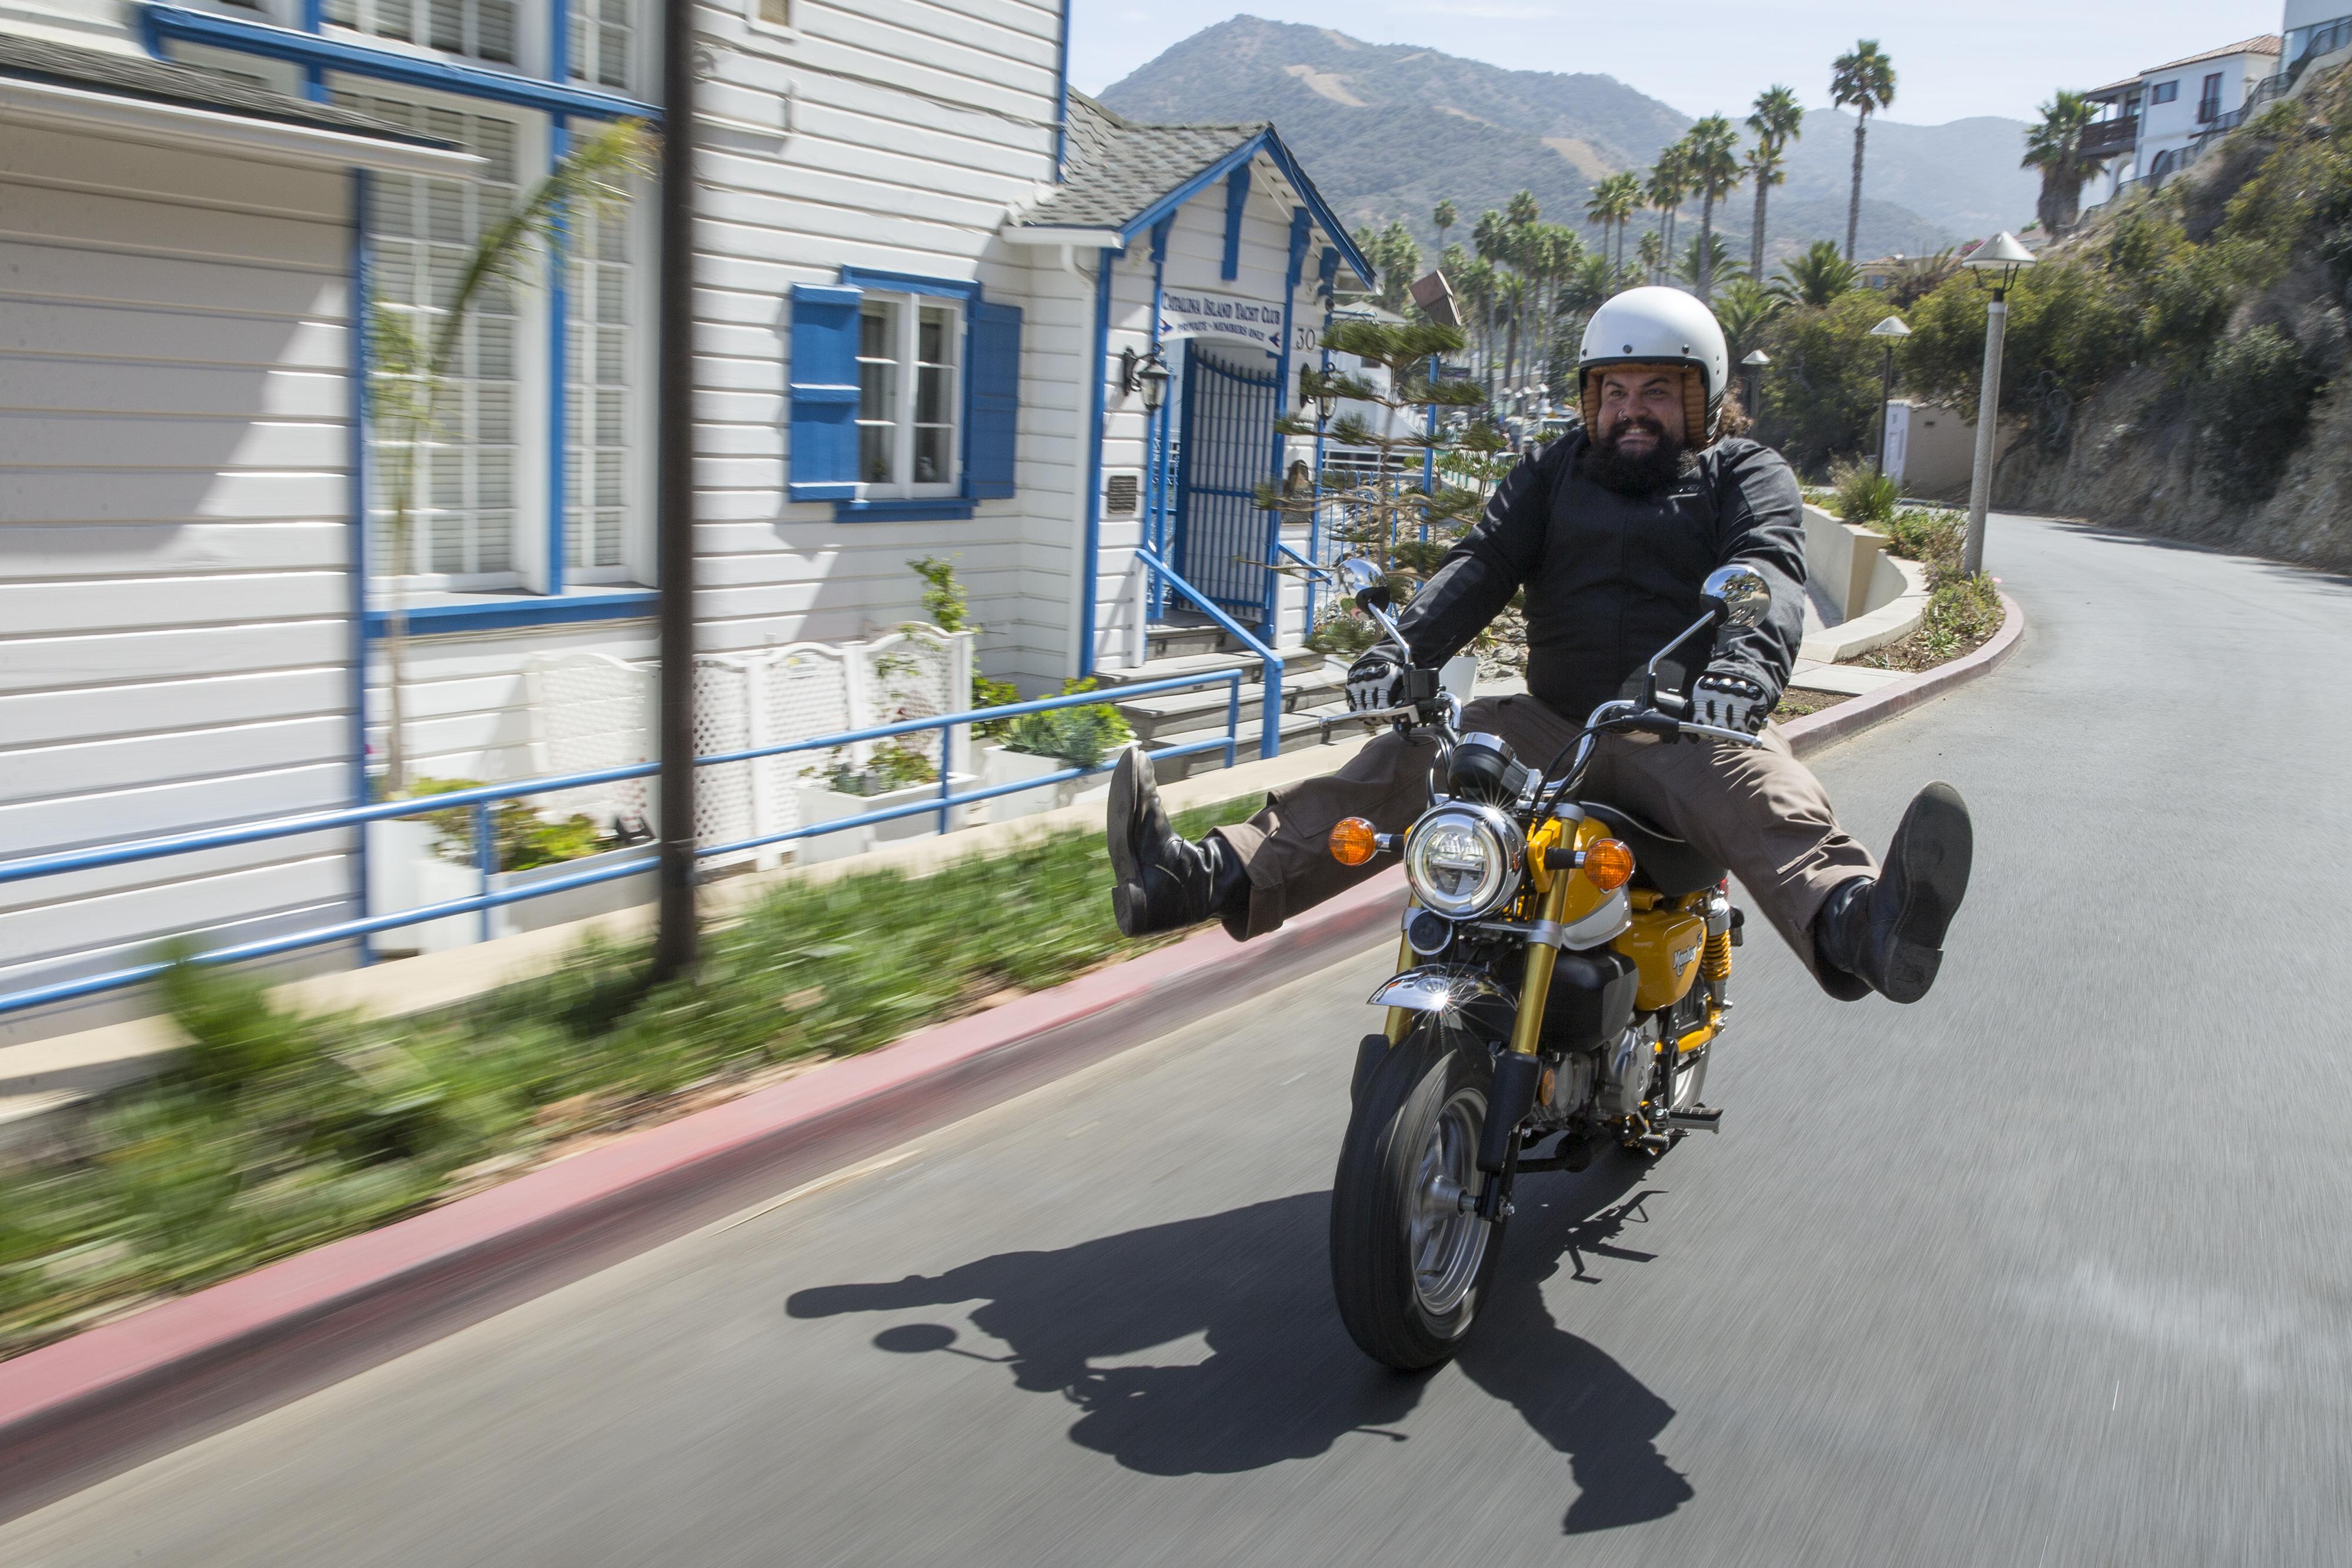 2019 Honda Monkey first ride review - RevZilla